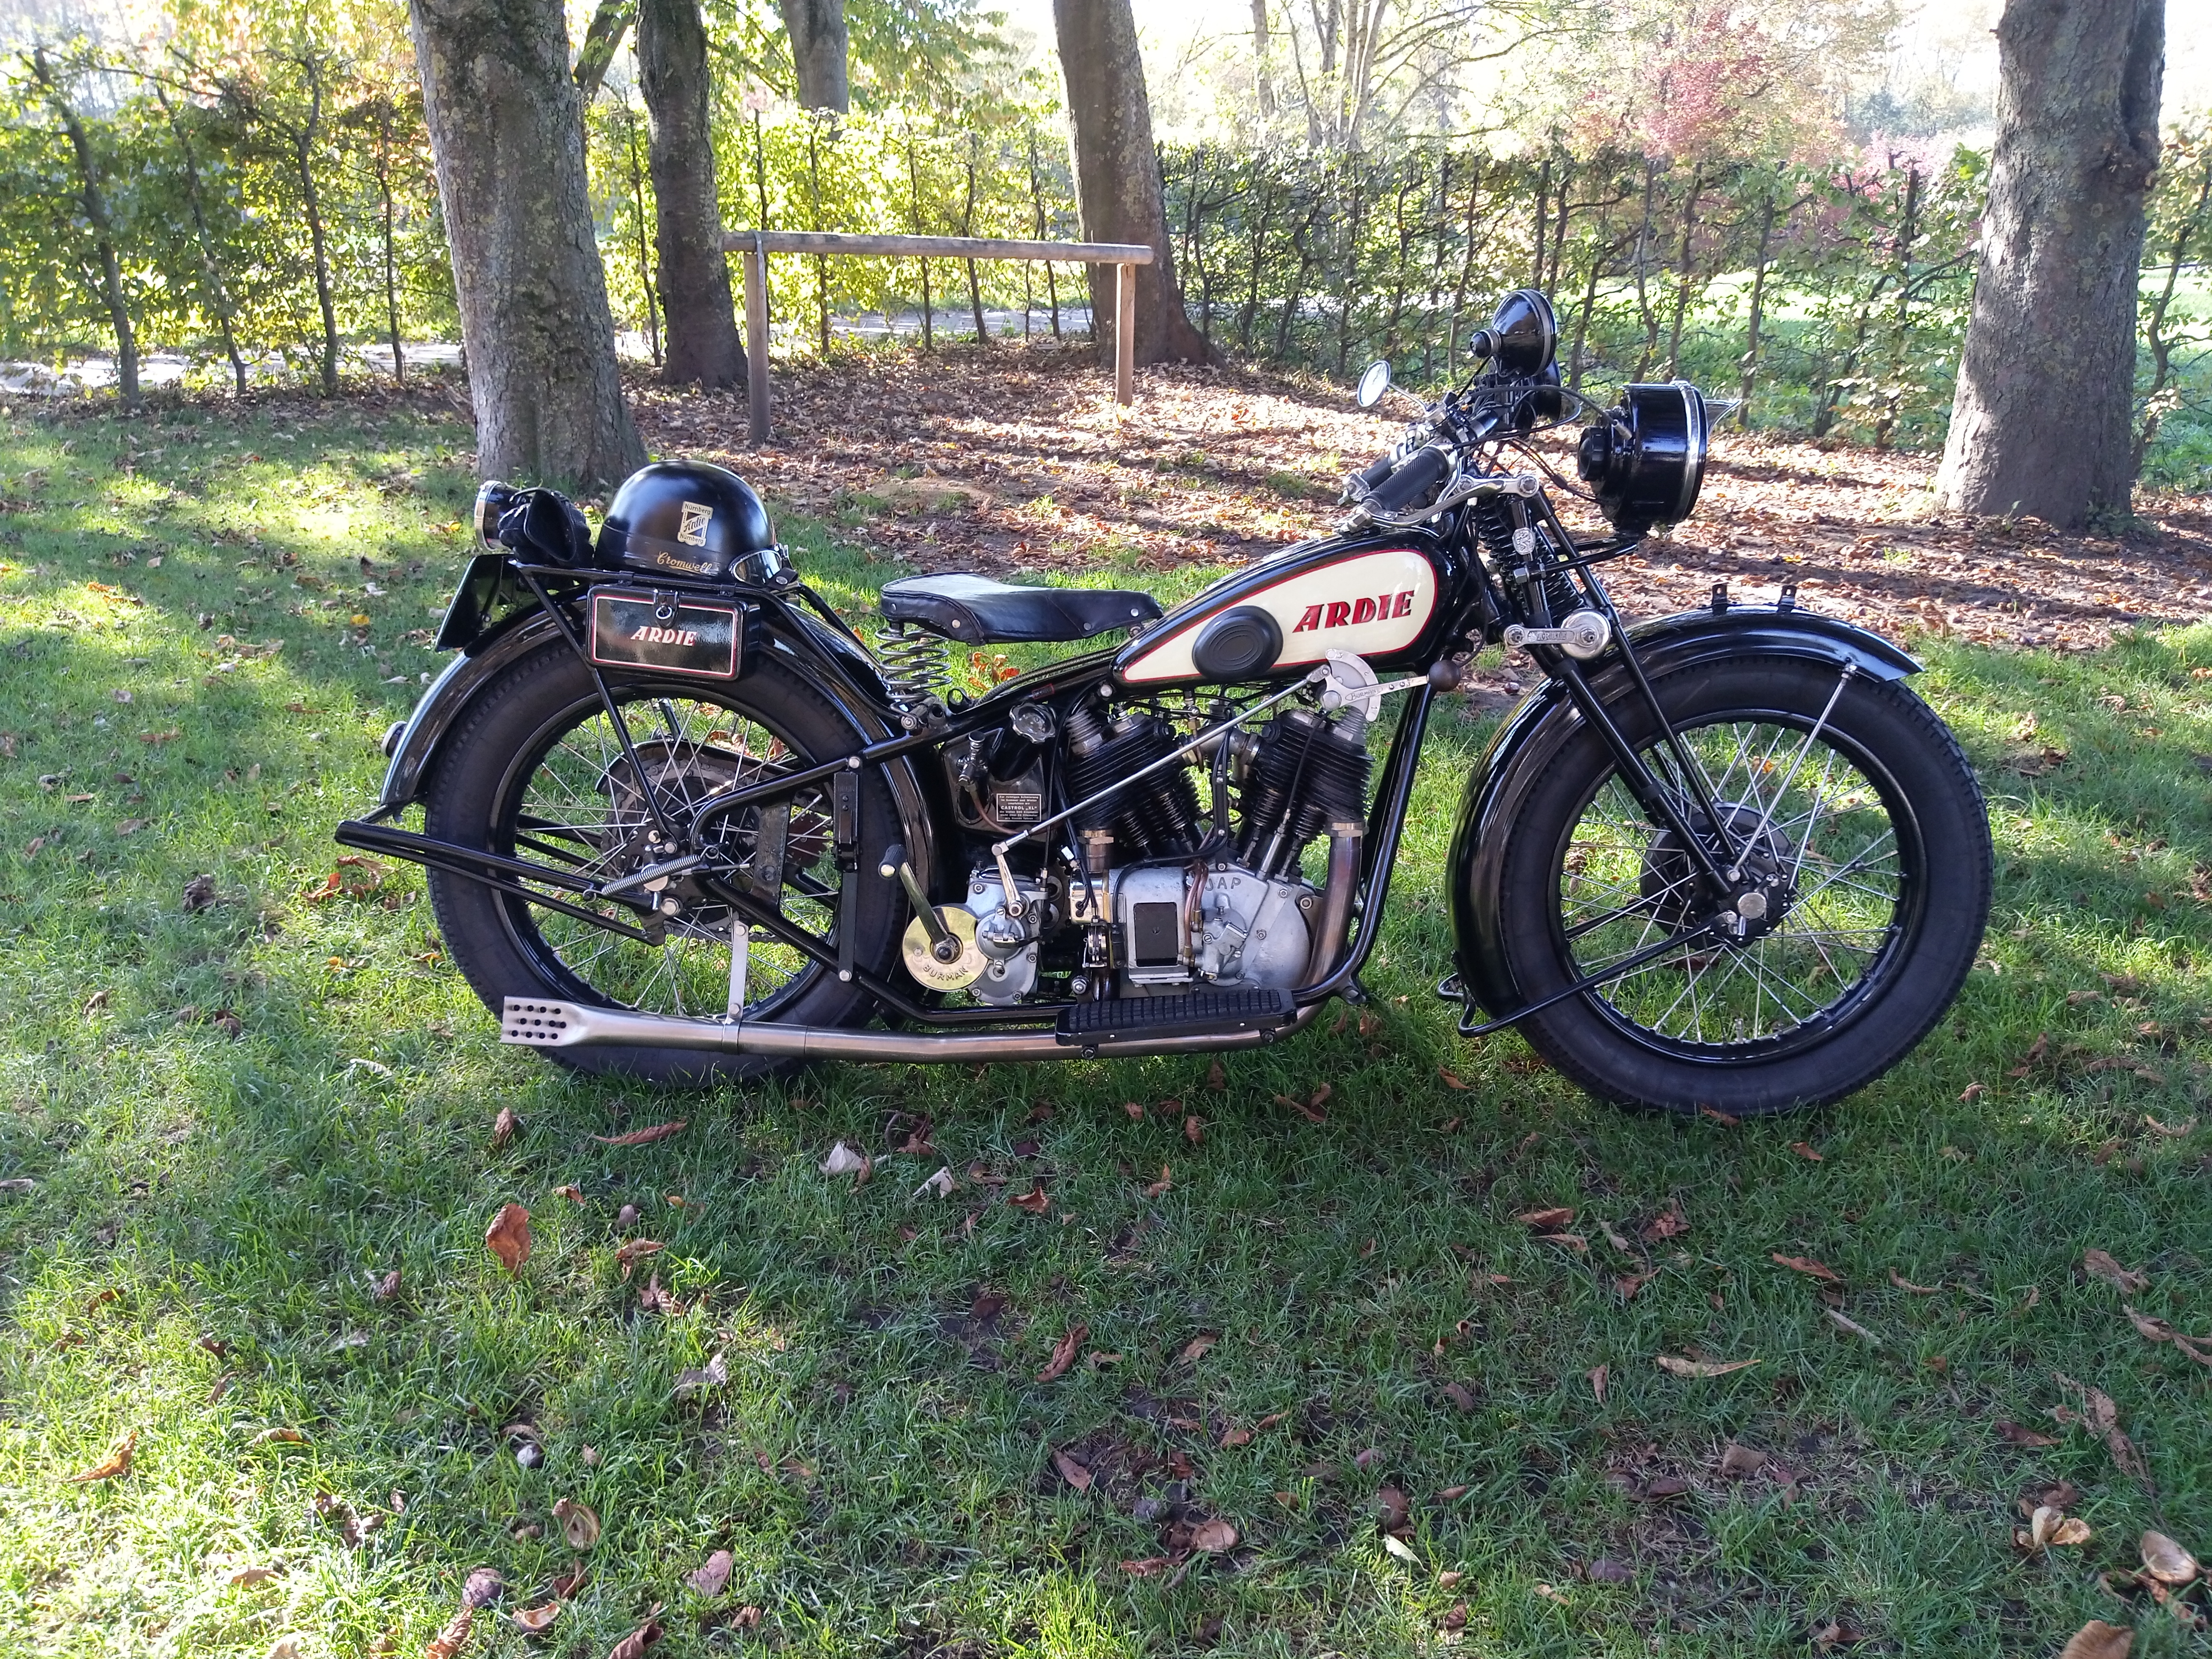 Ardie 1000cc, 1929, Michael Woche (D)